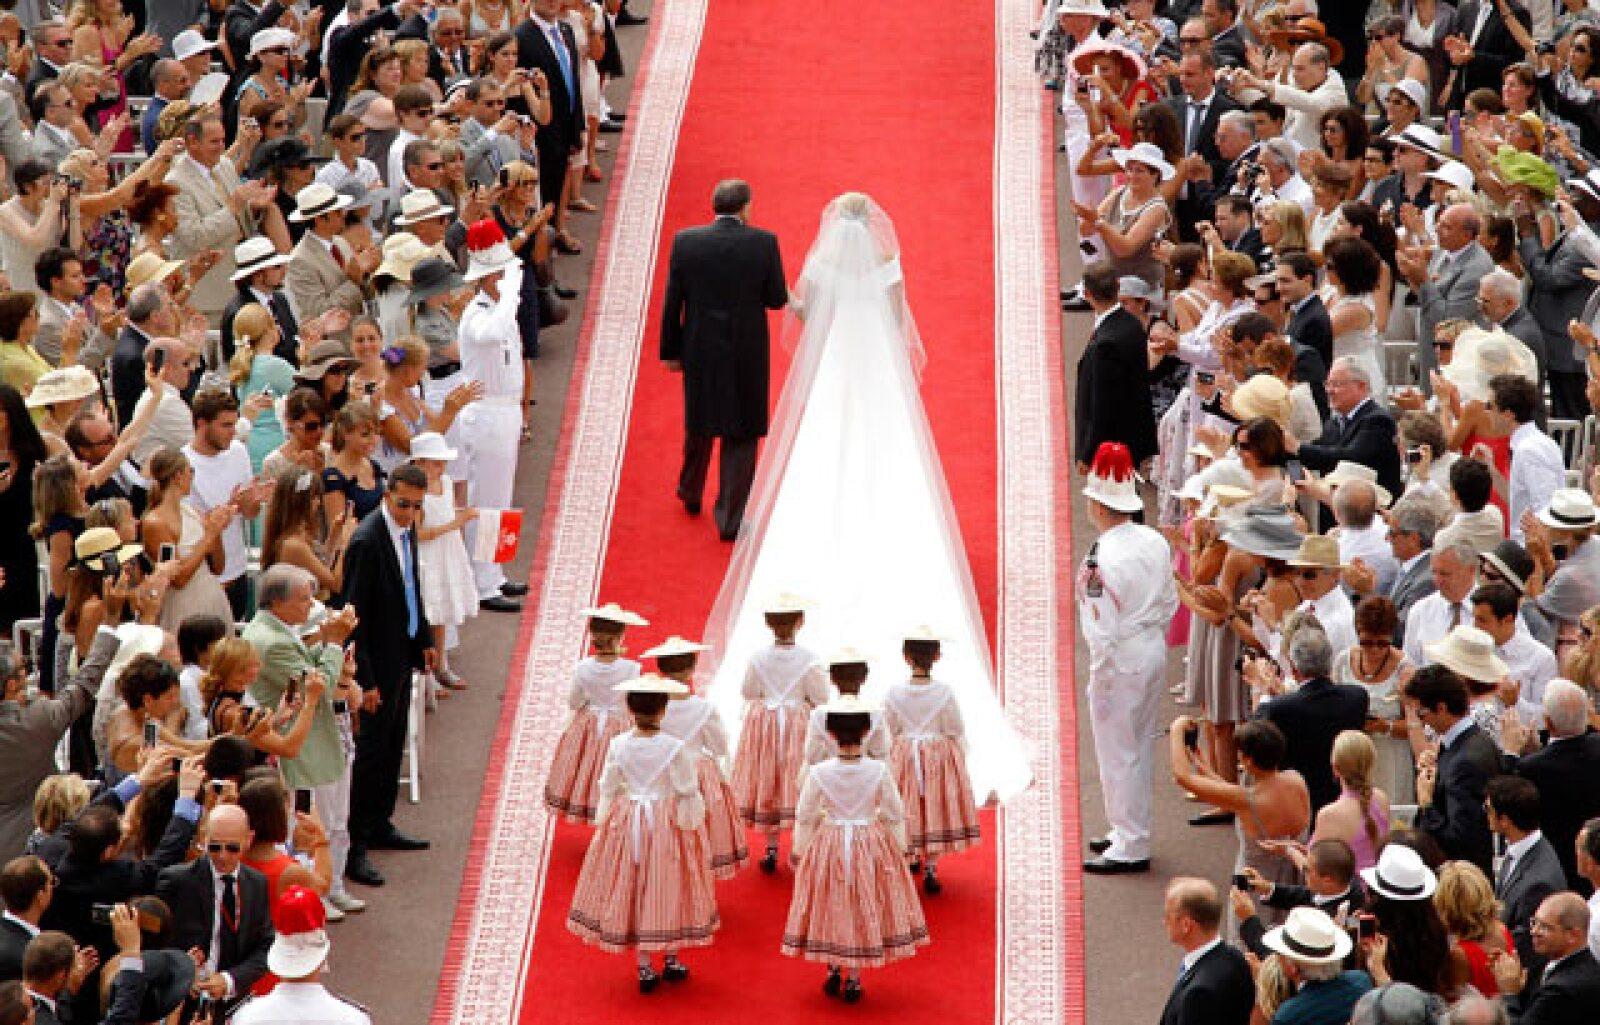 La novia, Charlene Wittstock, a su llegada al Palacio de Mónaco donde se realizó la boda.